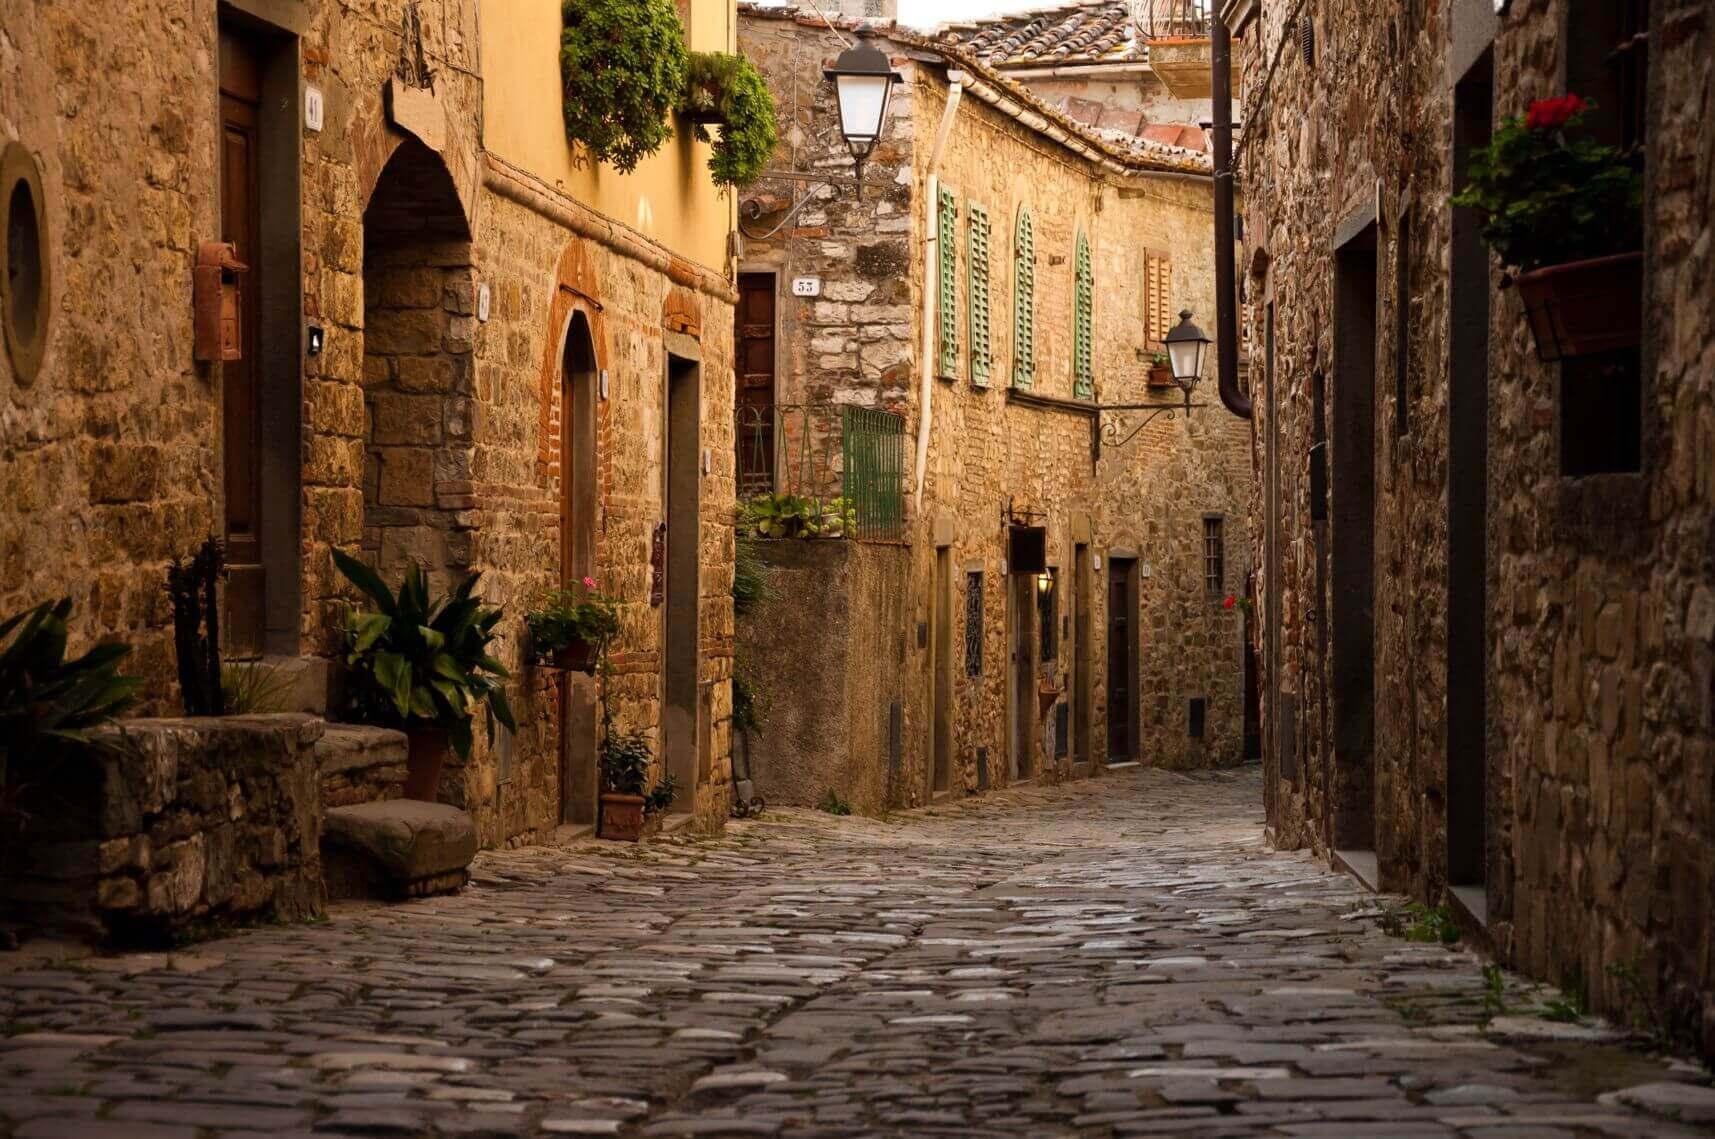 21-VisitChianti-Montefioralle-Greve-in-chianti-toscana-1715x1139